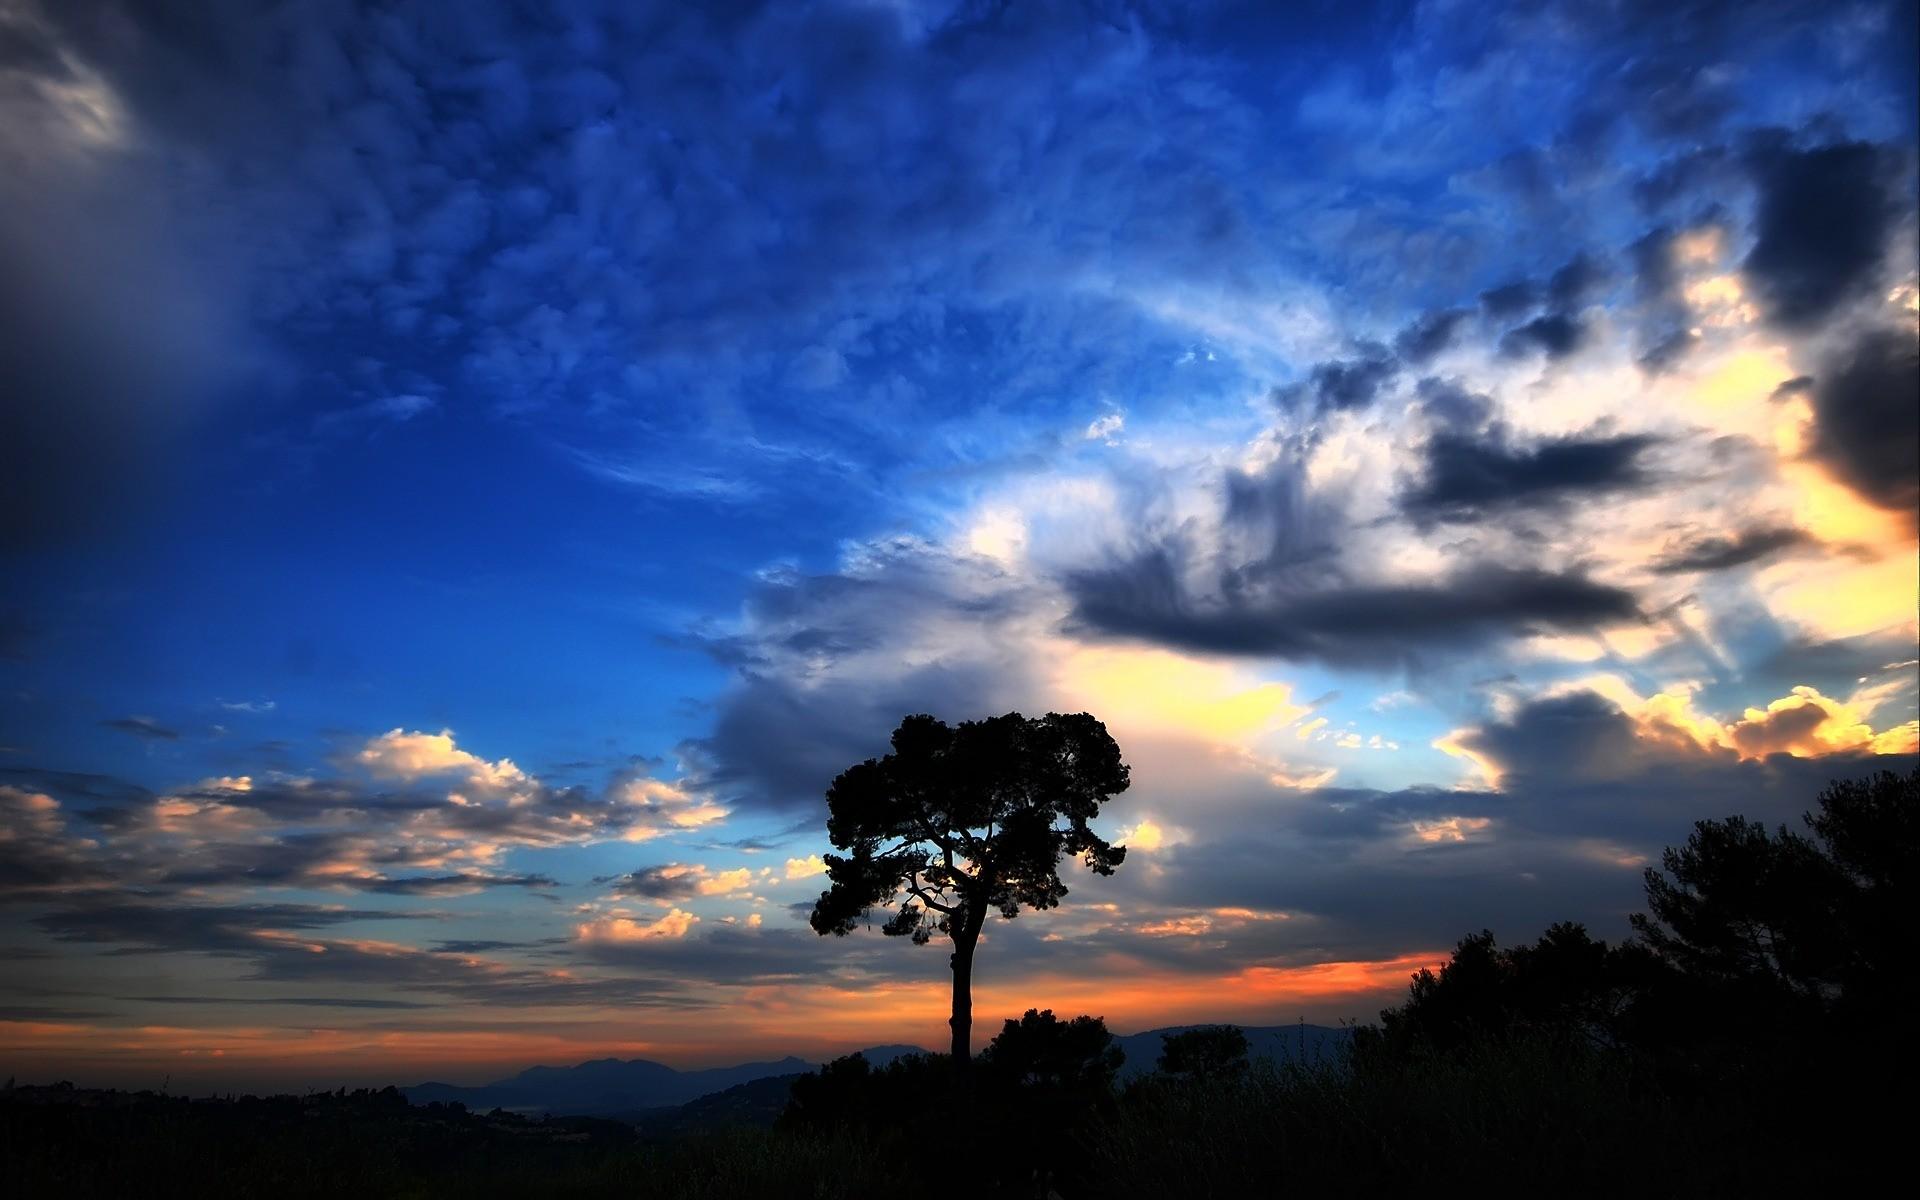 Beautiful Sky Wallpapers   HD Wallpapers   ID #8830